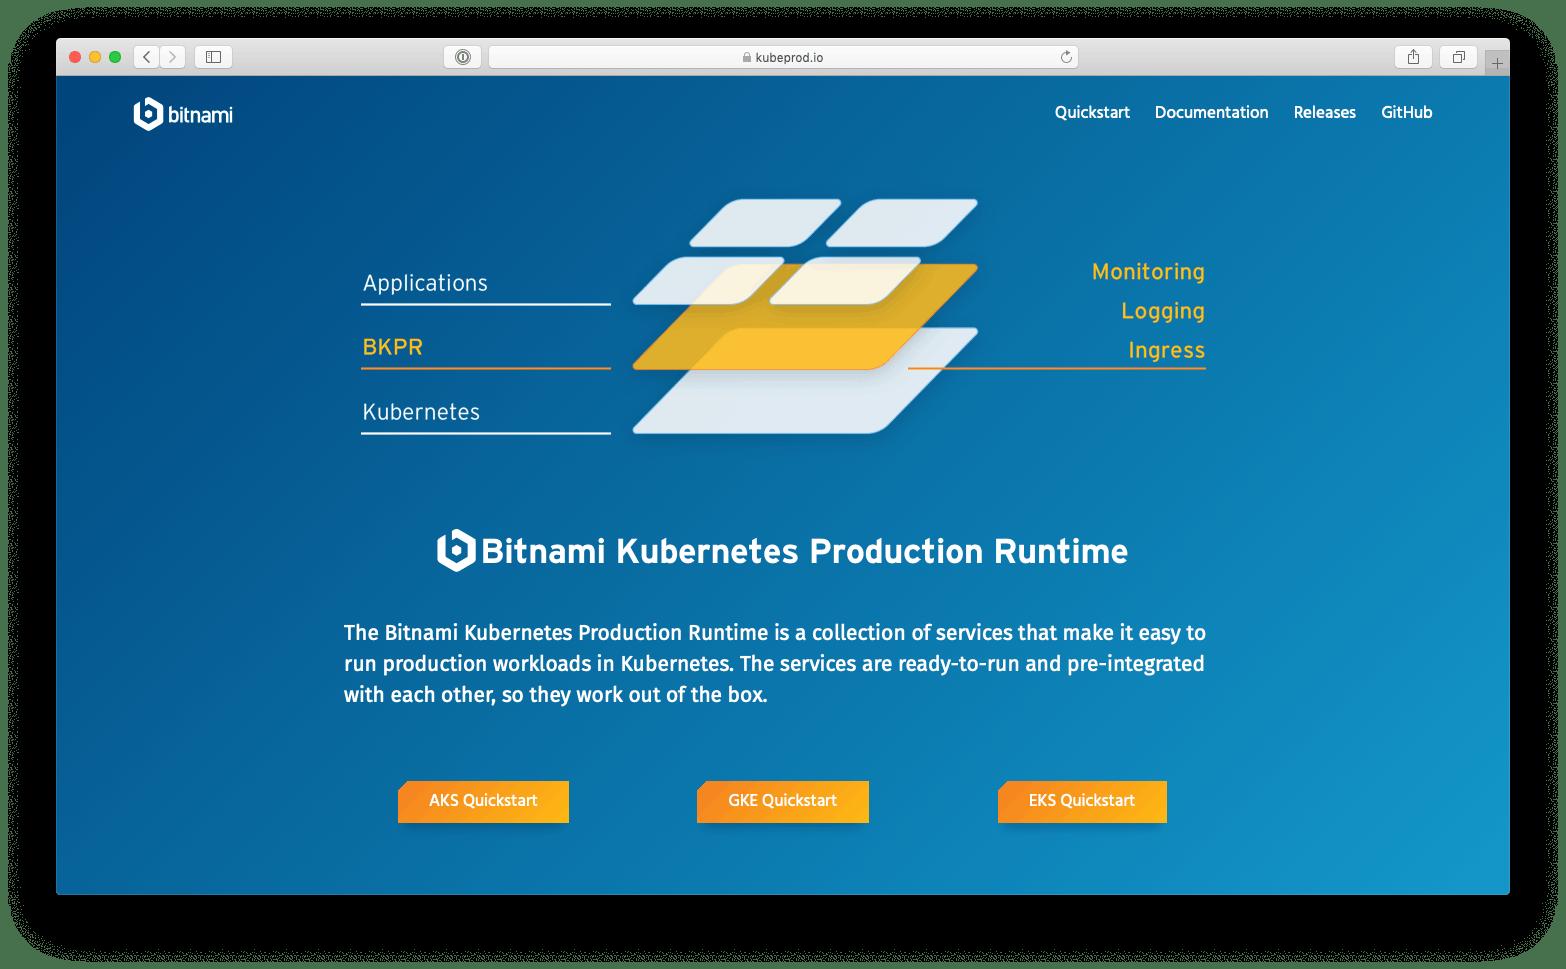 Bitnami Kubernetes Production Runtime (BKPR)